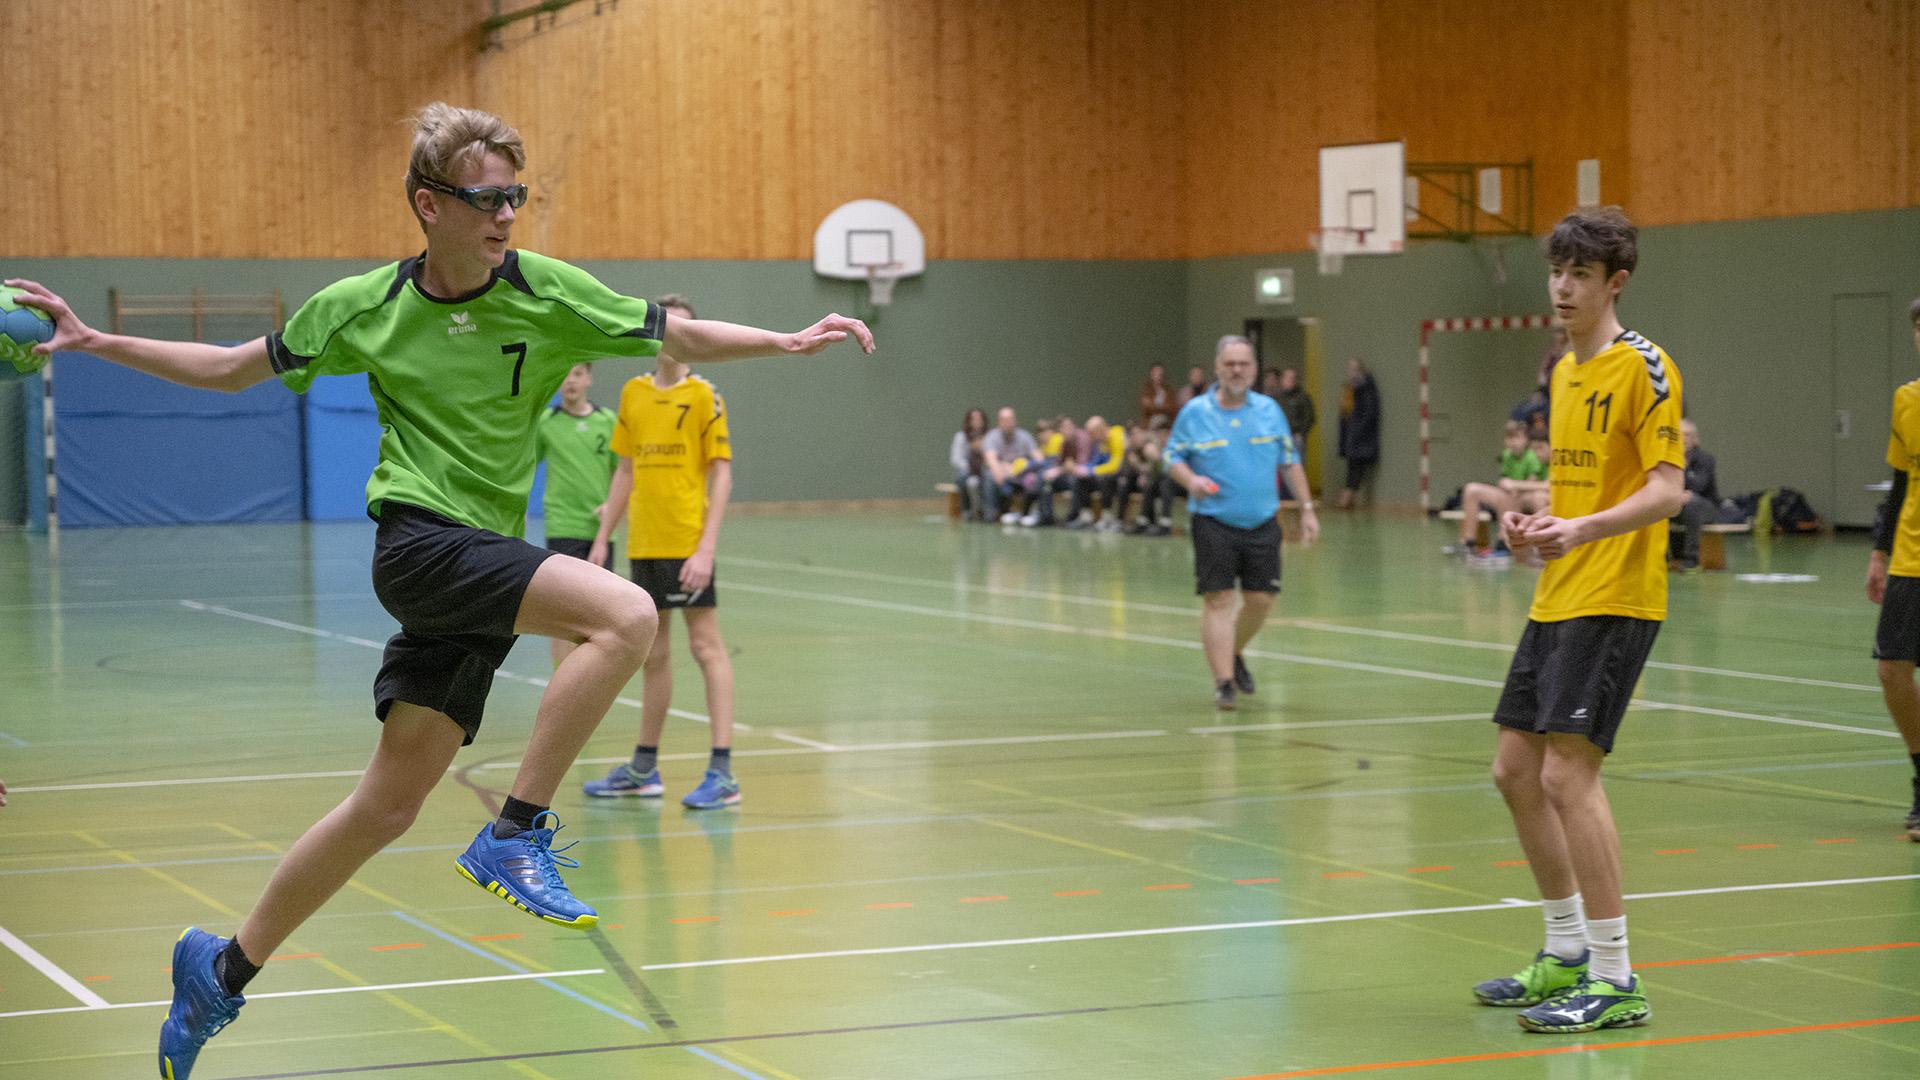 087Slider_mB_tsg_leutkirch_handball